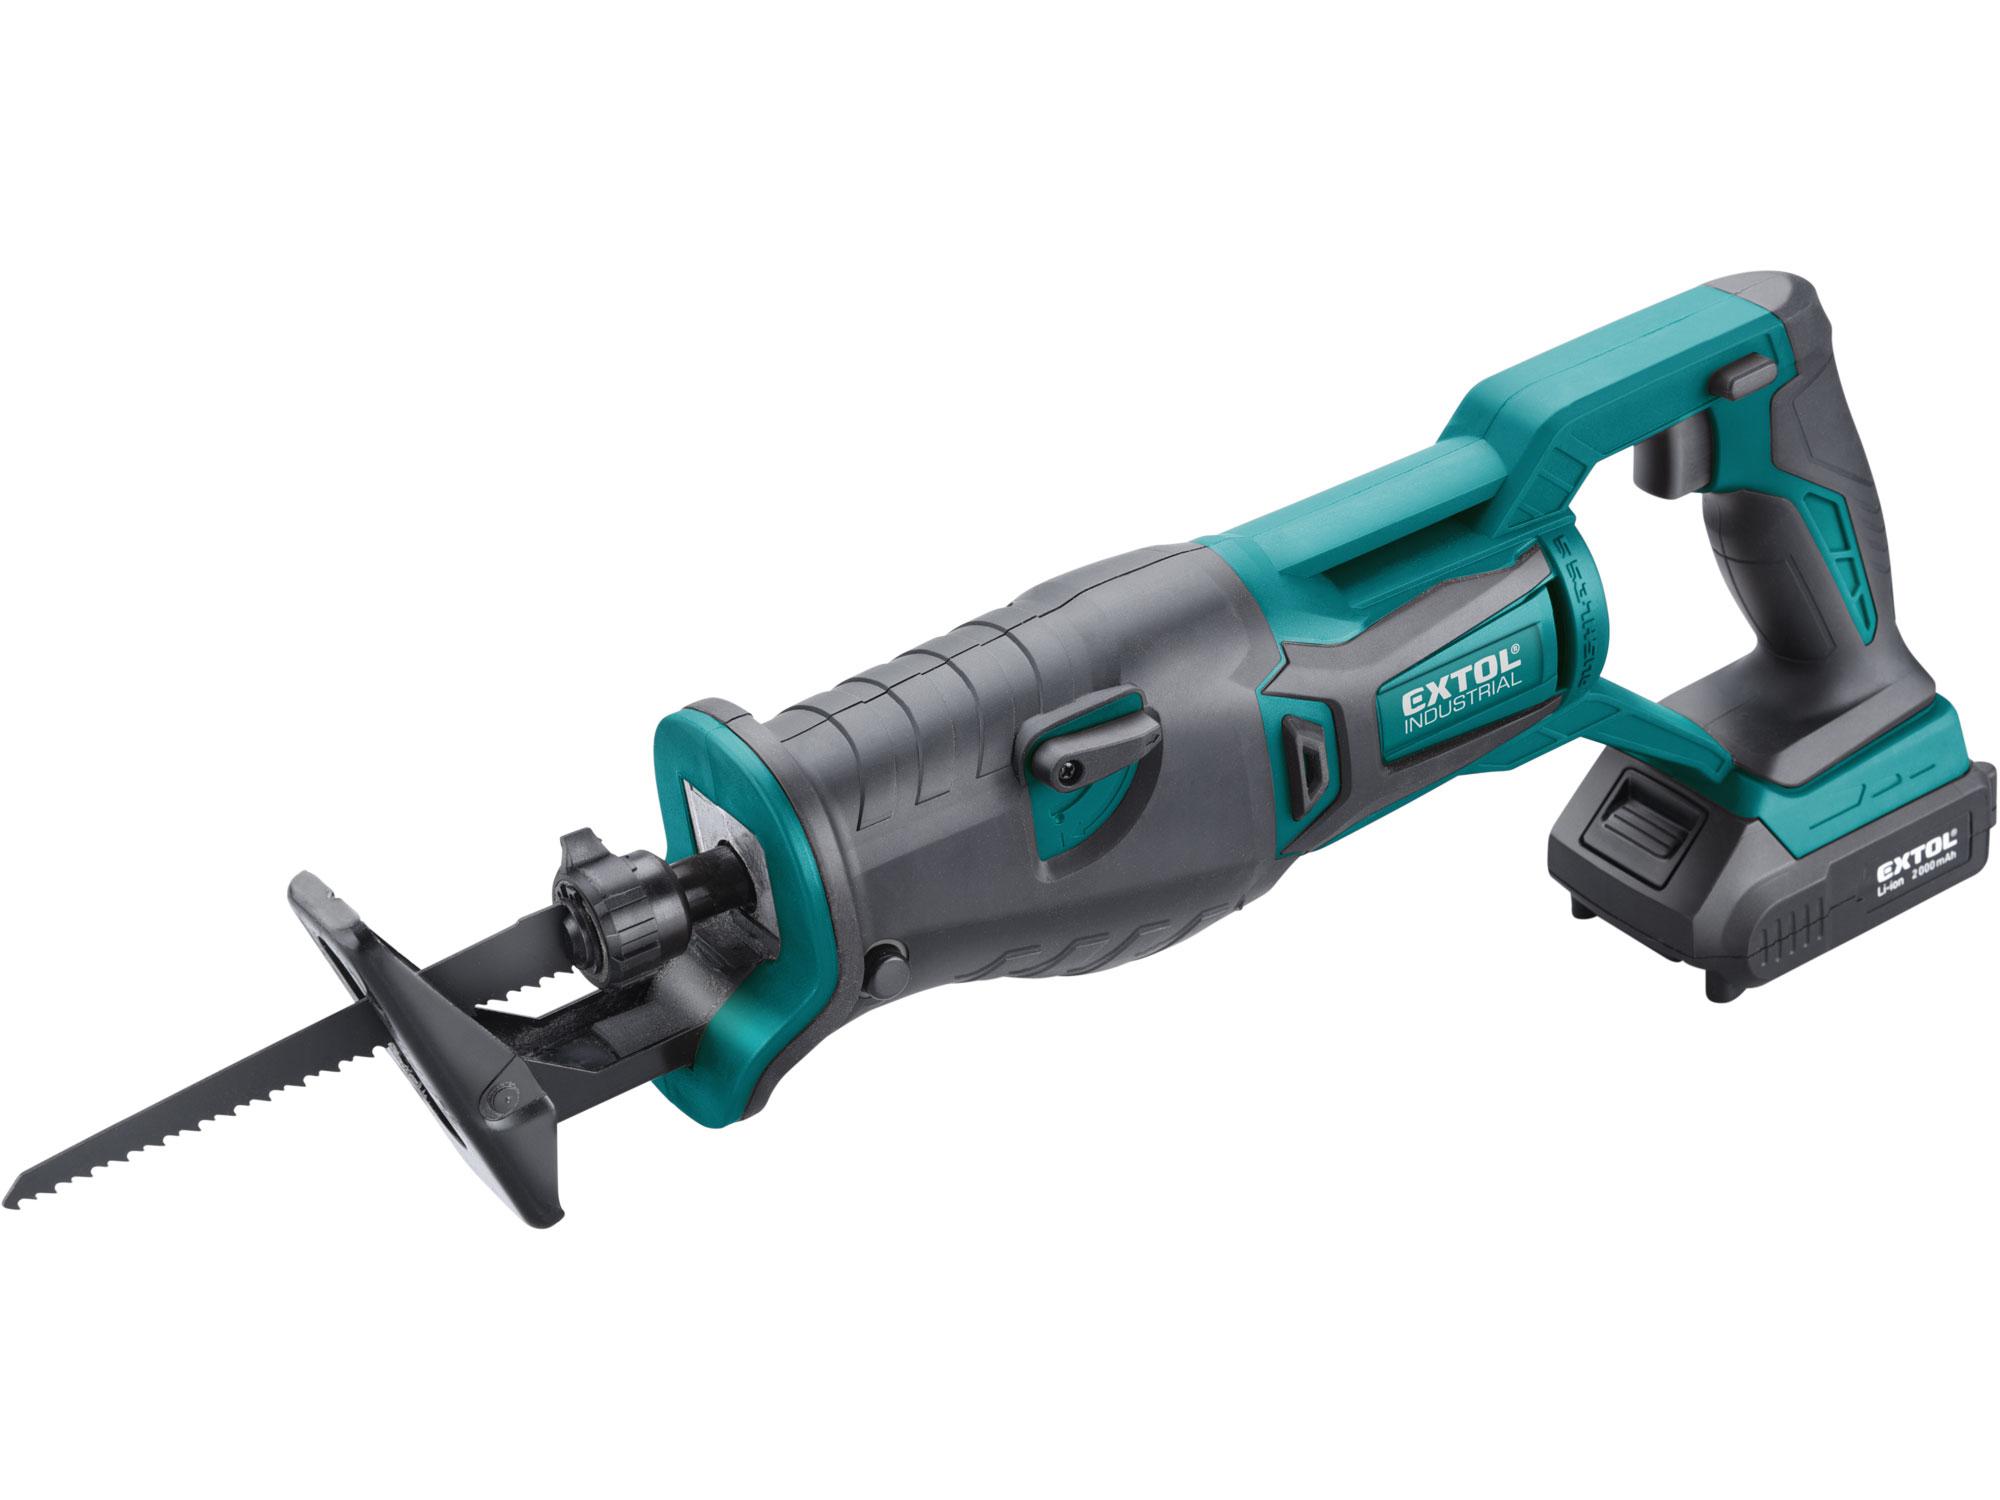 Cordless Brushless Reciprocating Saw, SHARE20V, 1x2000mAh Battery